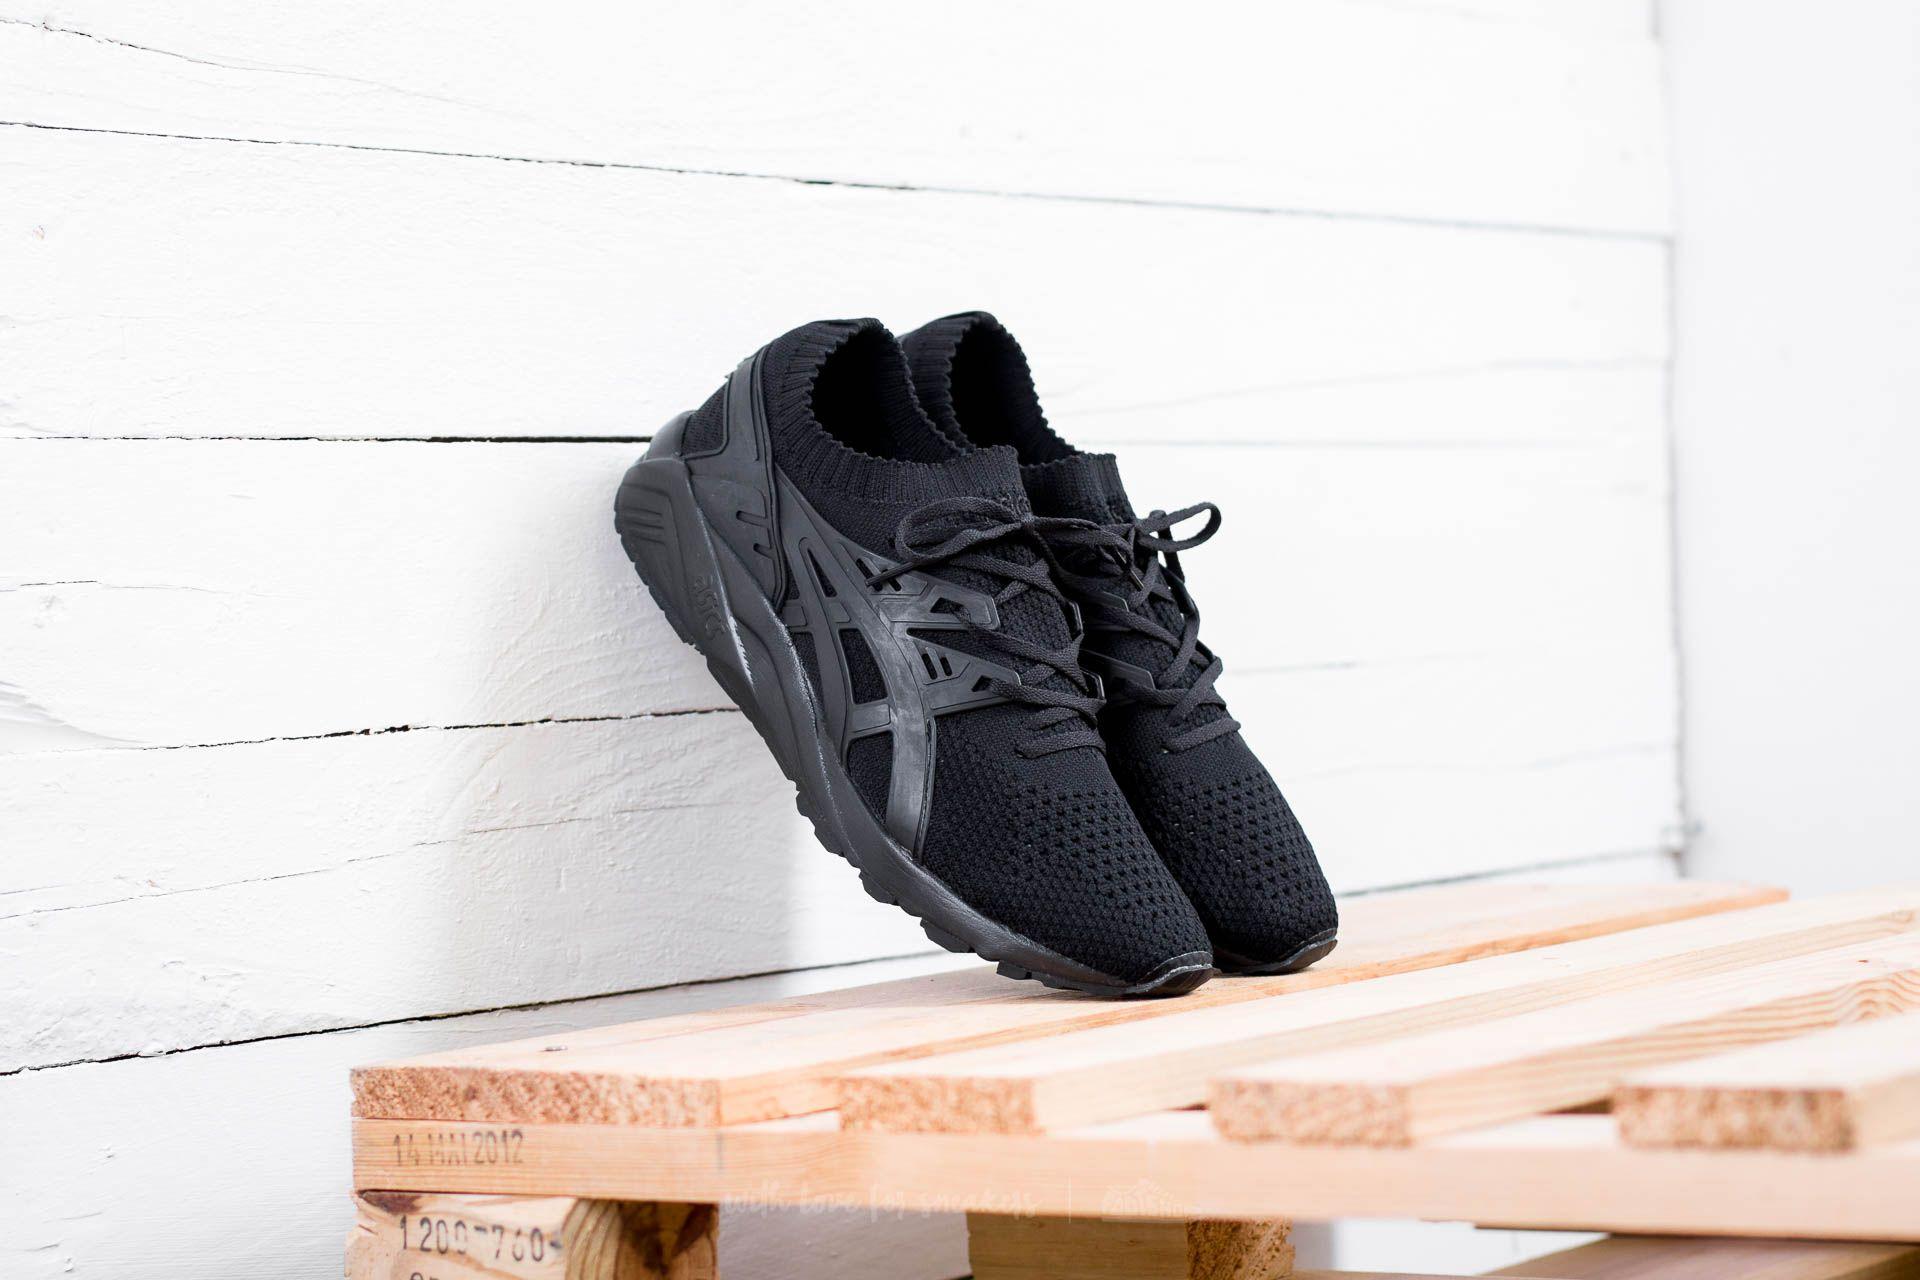 Asics Gel-Kayano Trainer Knit Black/ Black